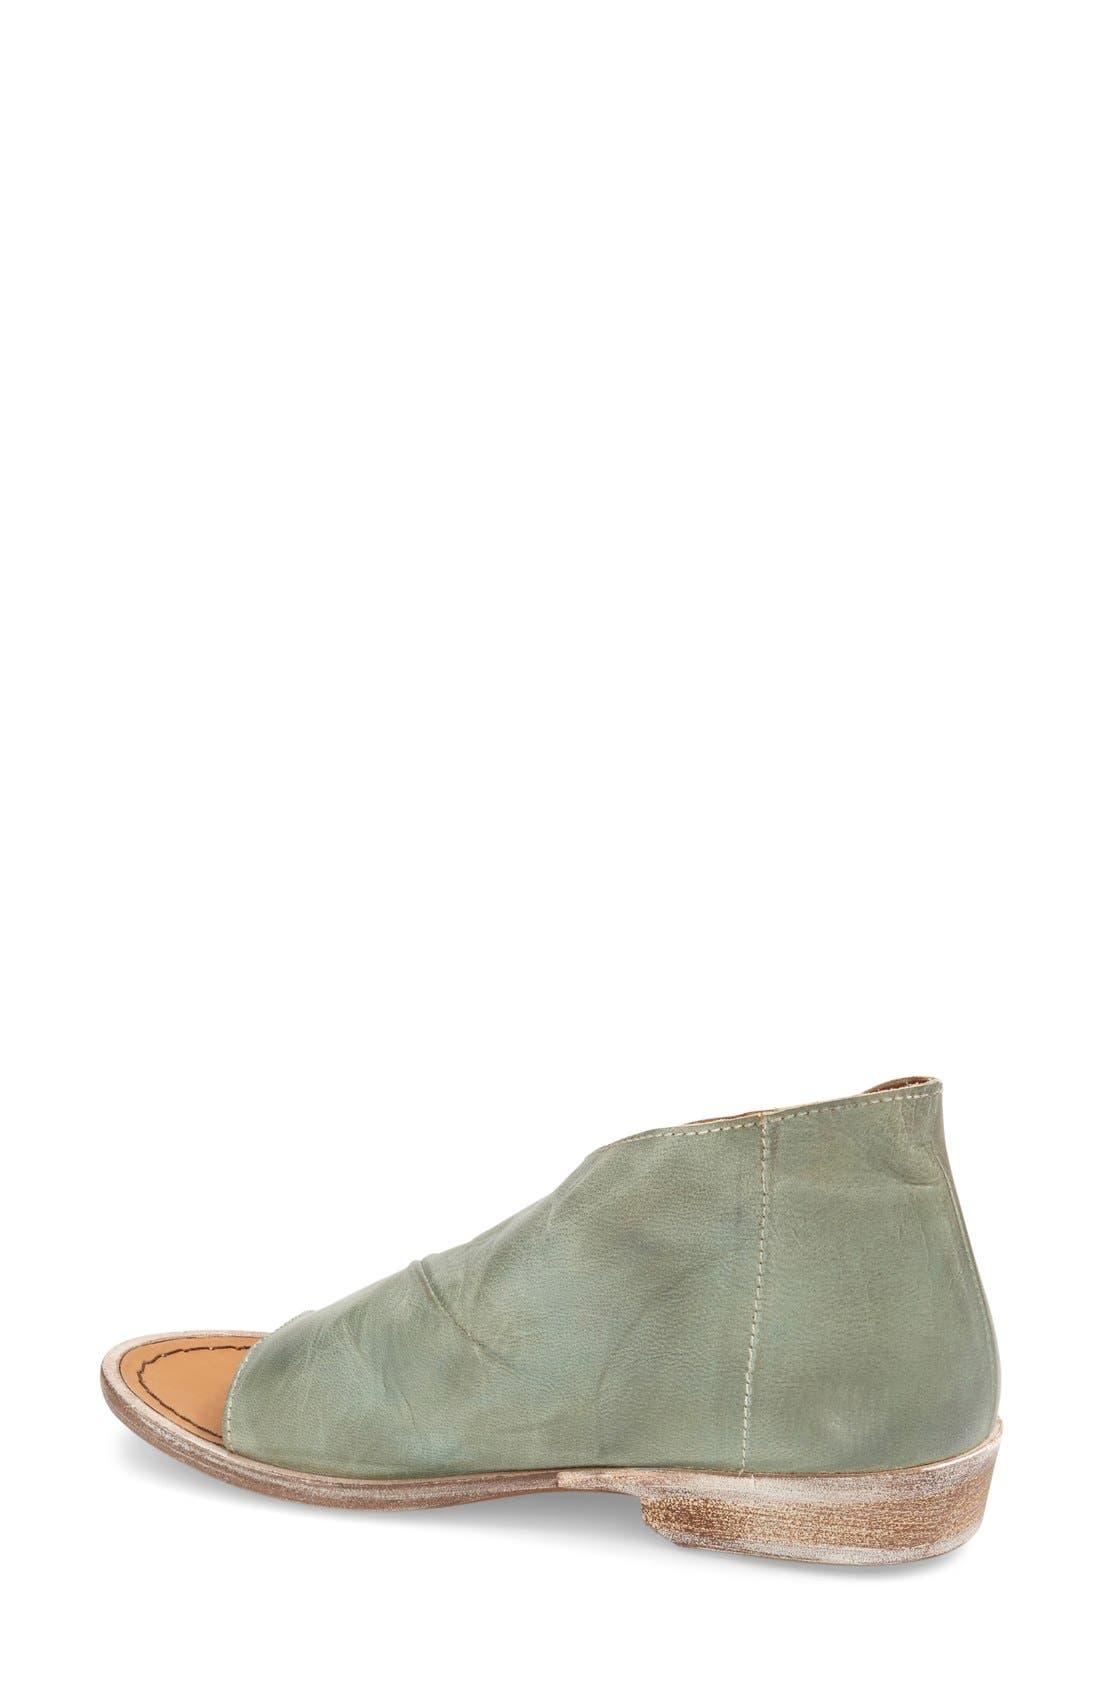 'Mont Blanc' Asymmetrical Sandal,                             Alternate thumbnail 27, color,